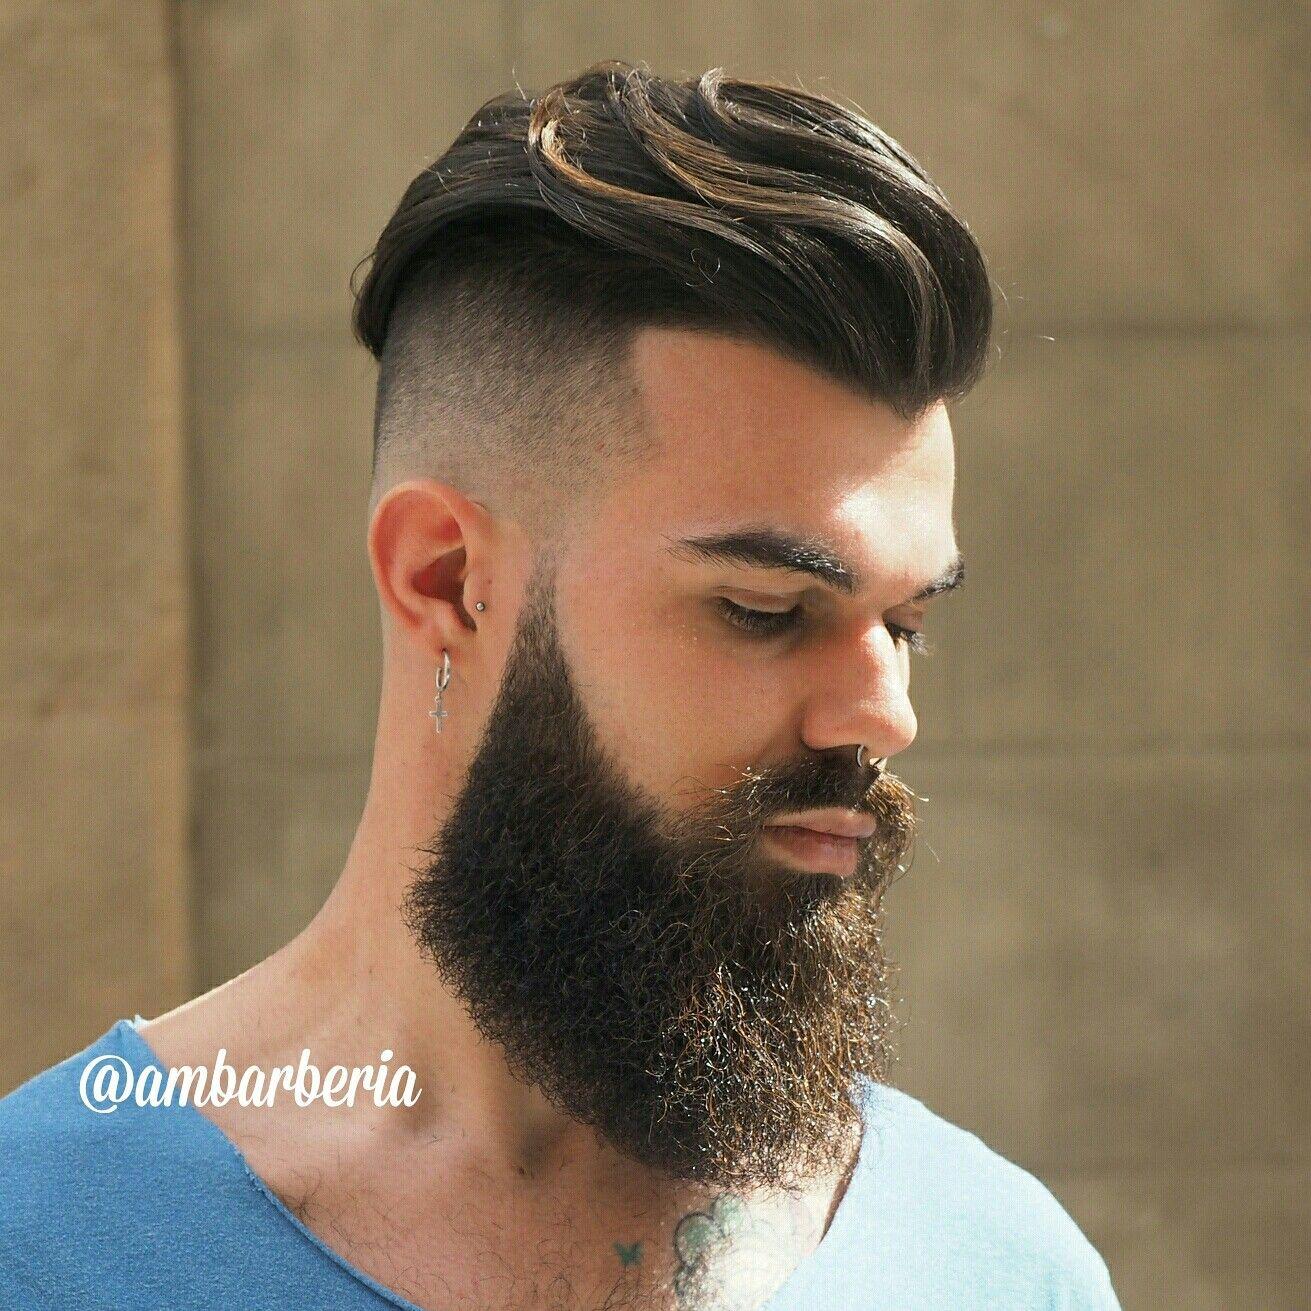 Pin by Saurav Satpute on saurav | Pinterest | Hairstyle men, Beard ...